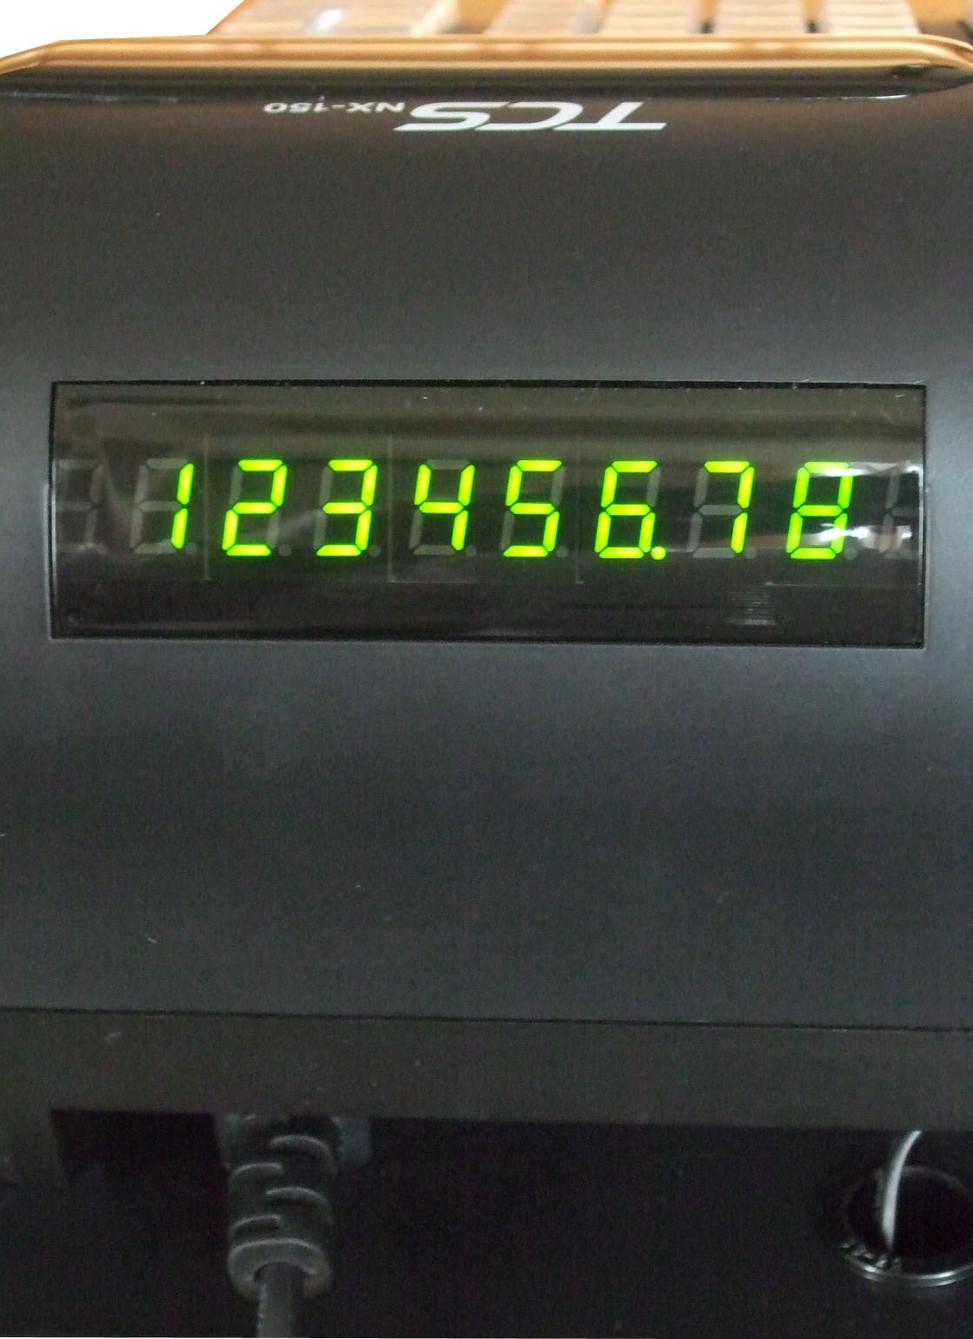 NX-150 Customer Display.jpg